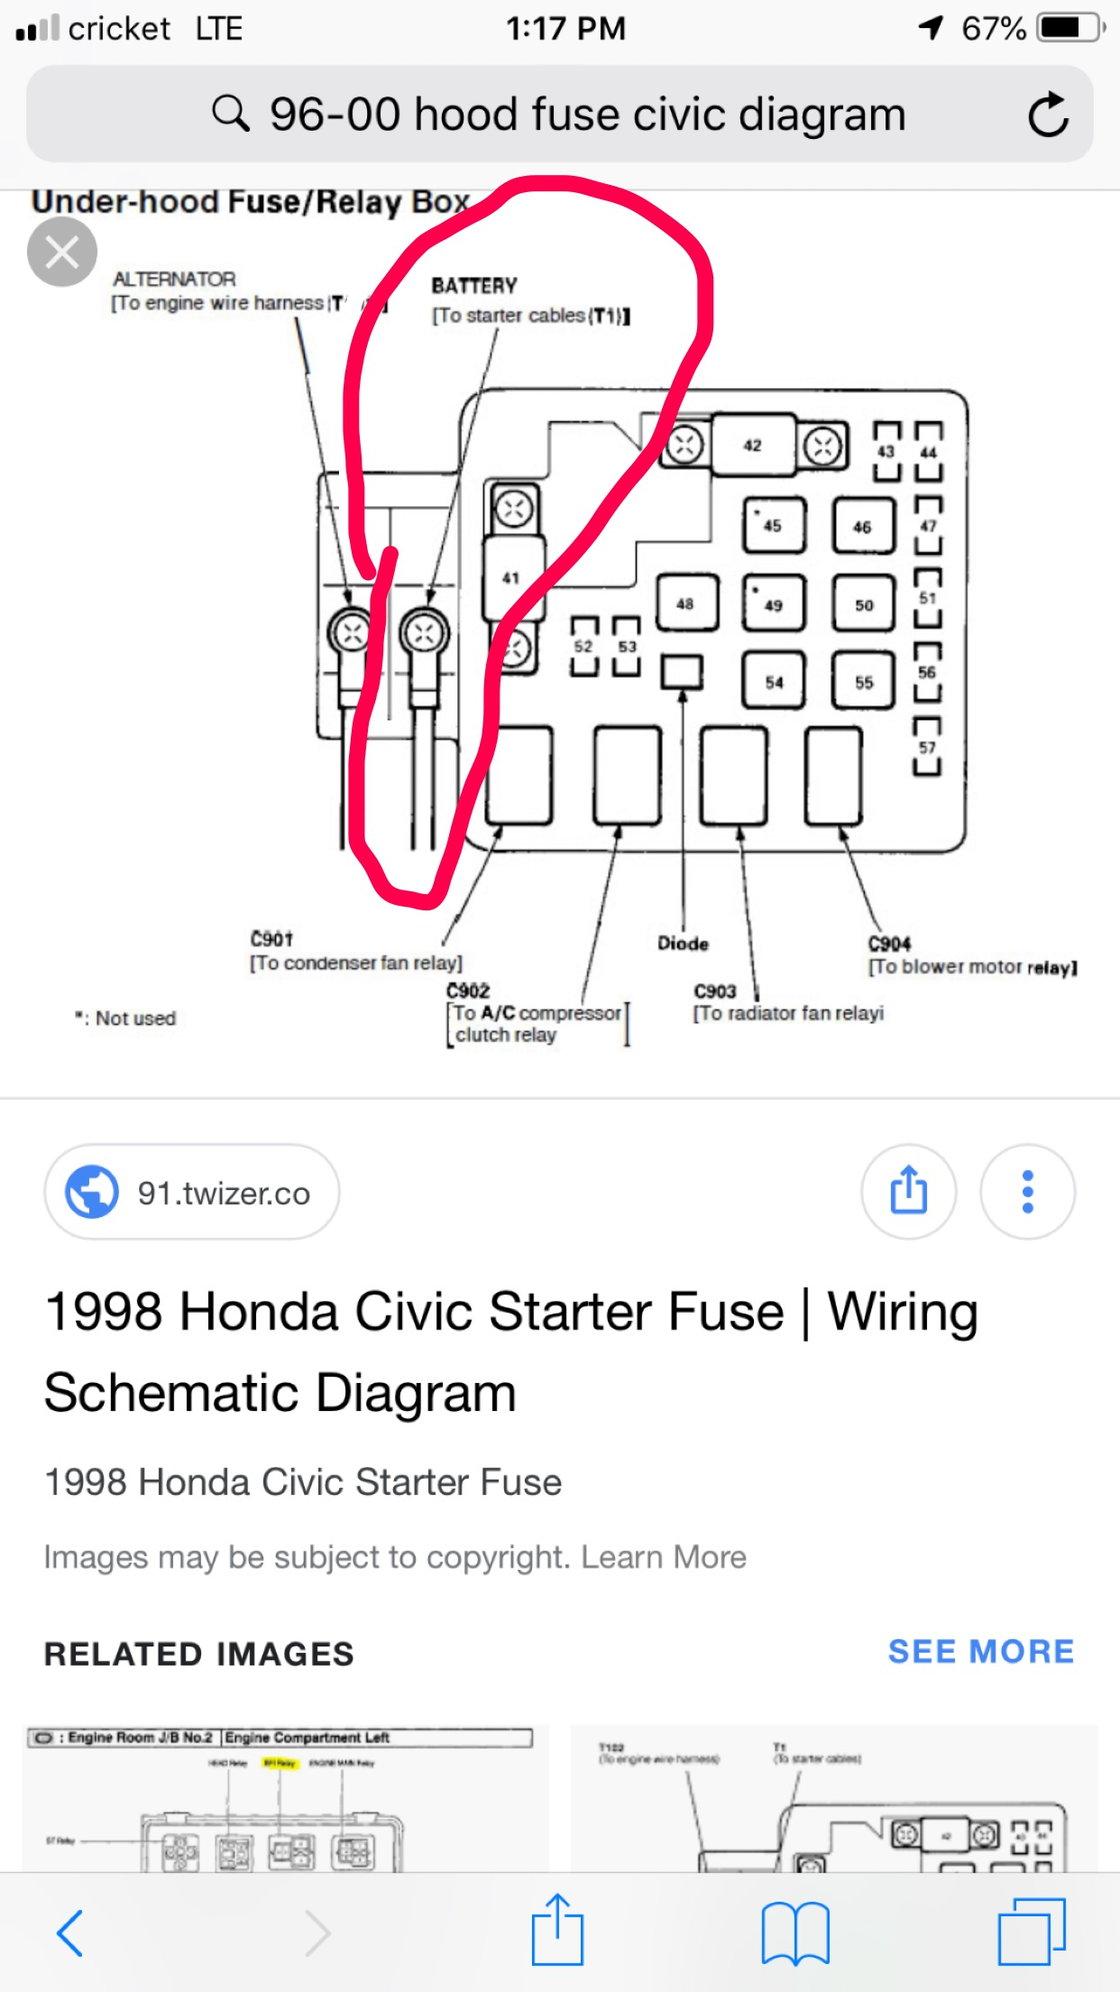 Honda Civic Fuse Box Tuck - John Deere 316 Onan Engine Wiring Diagram Free  Download for Wiring Diagram Schematics | Civic Fuse Box Wiring |  | Wiring Diagram Schematics